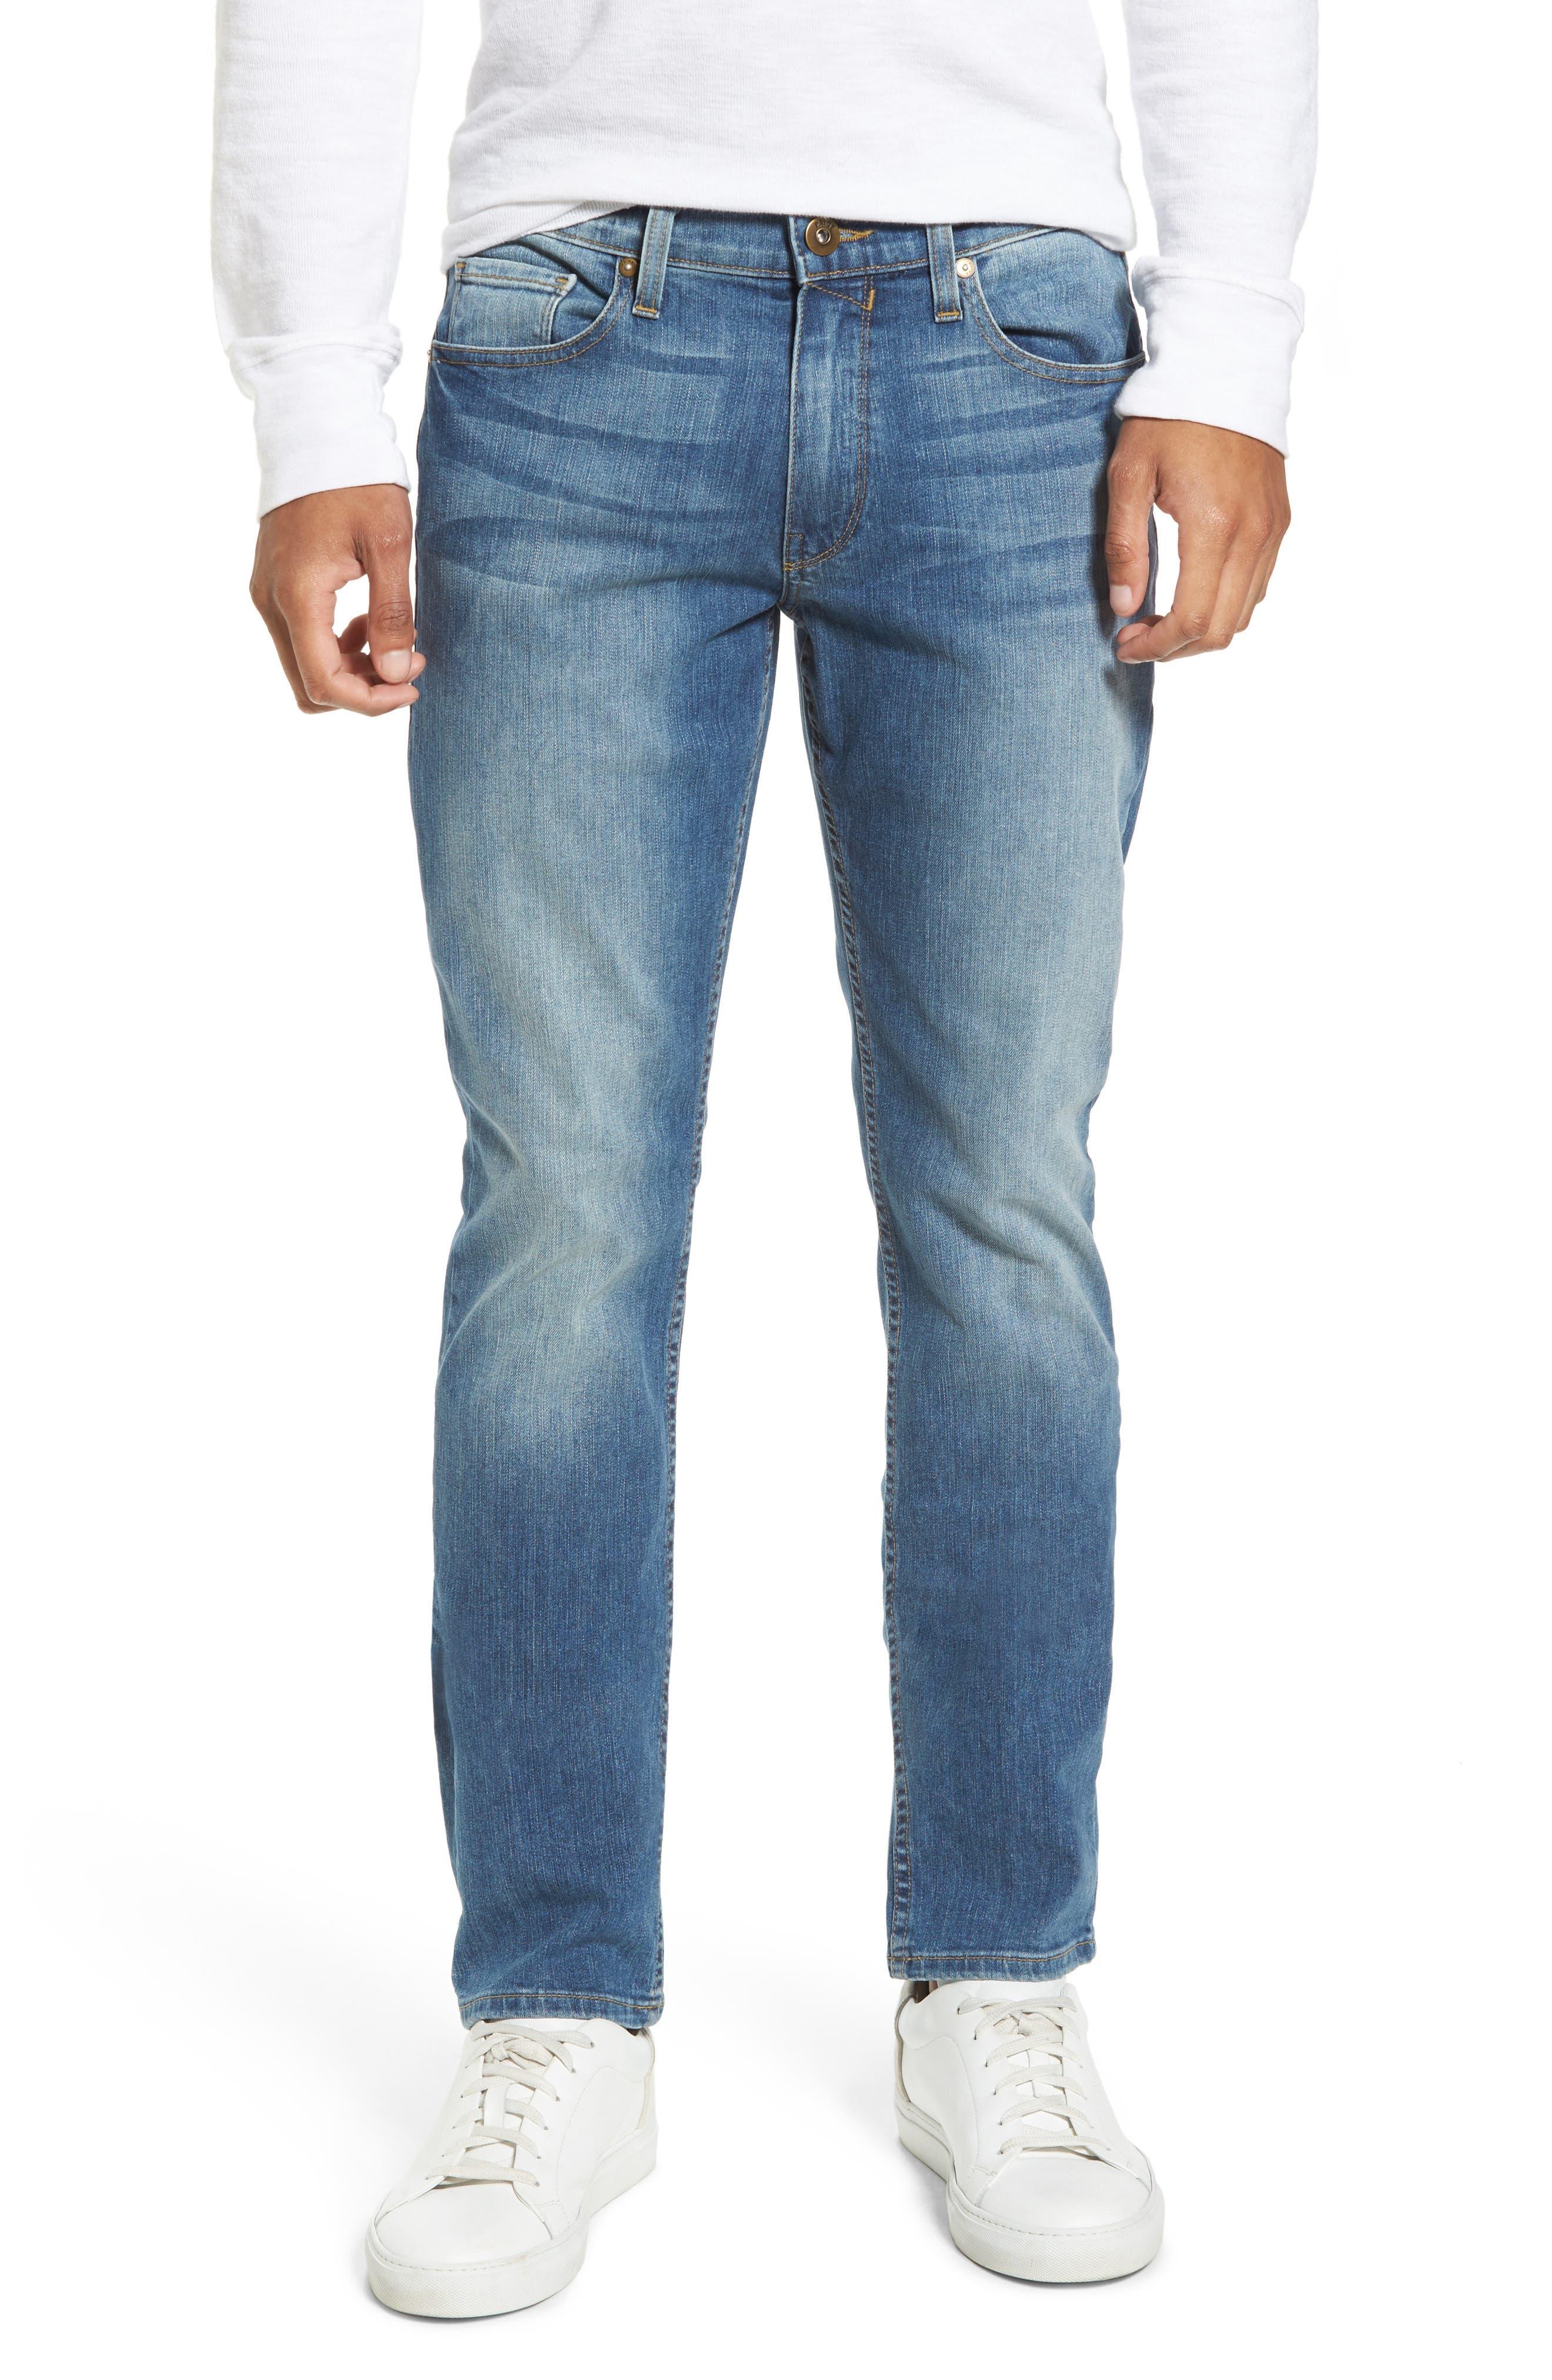 PAIGE Legacy - Lennox Slim Fit Jeans (Steele)